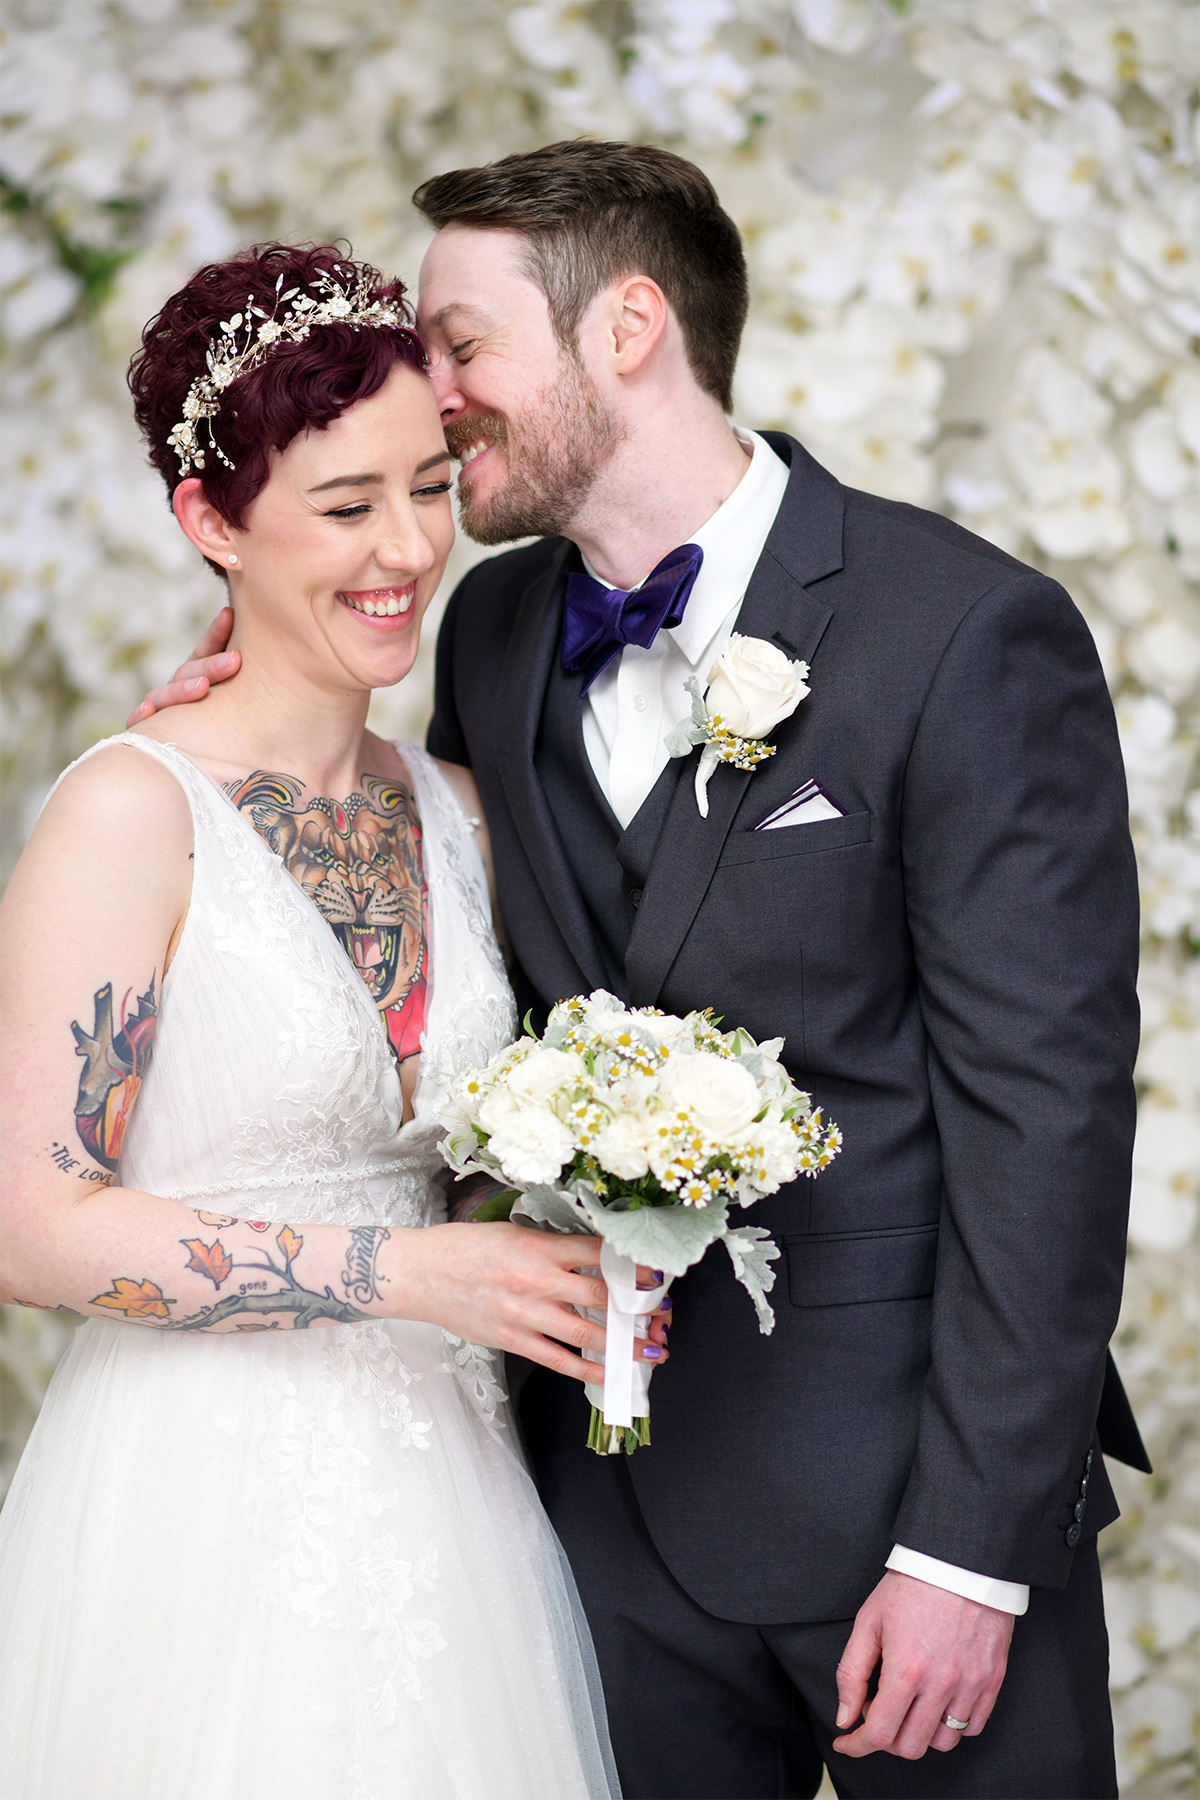 Albertson Wedding Chapel civil ceremonies 2020